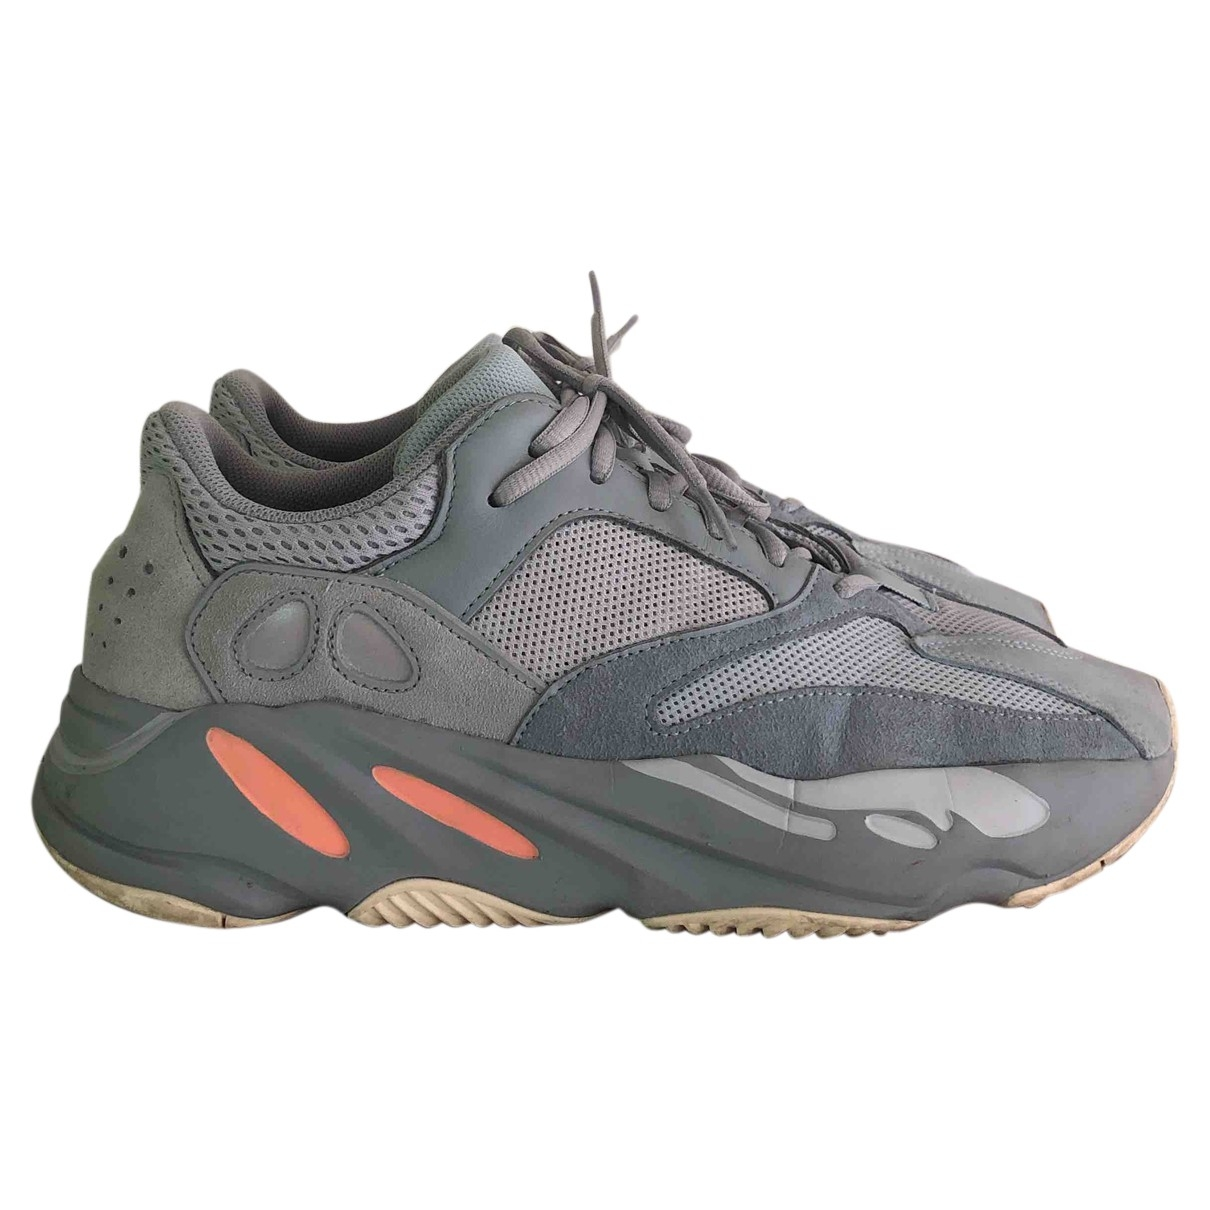 Yeezy X Adidas - Baskets Boost 700 V1  pour homme en suede - gris